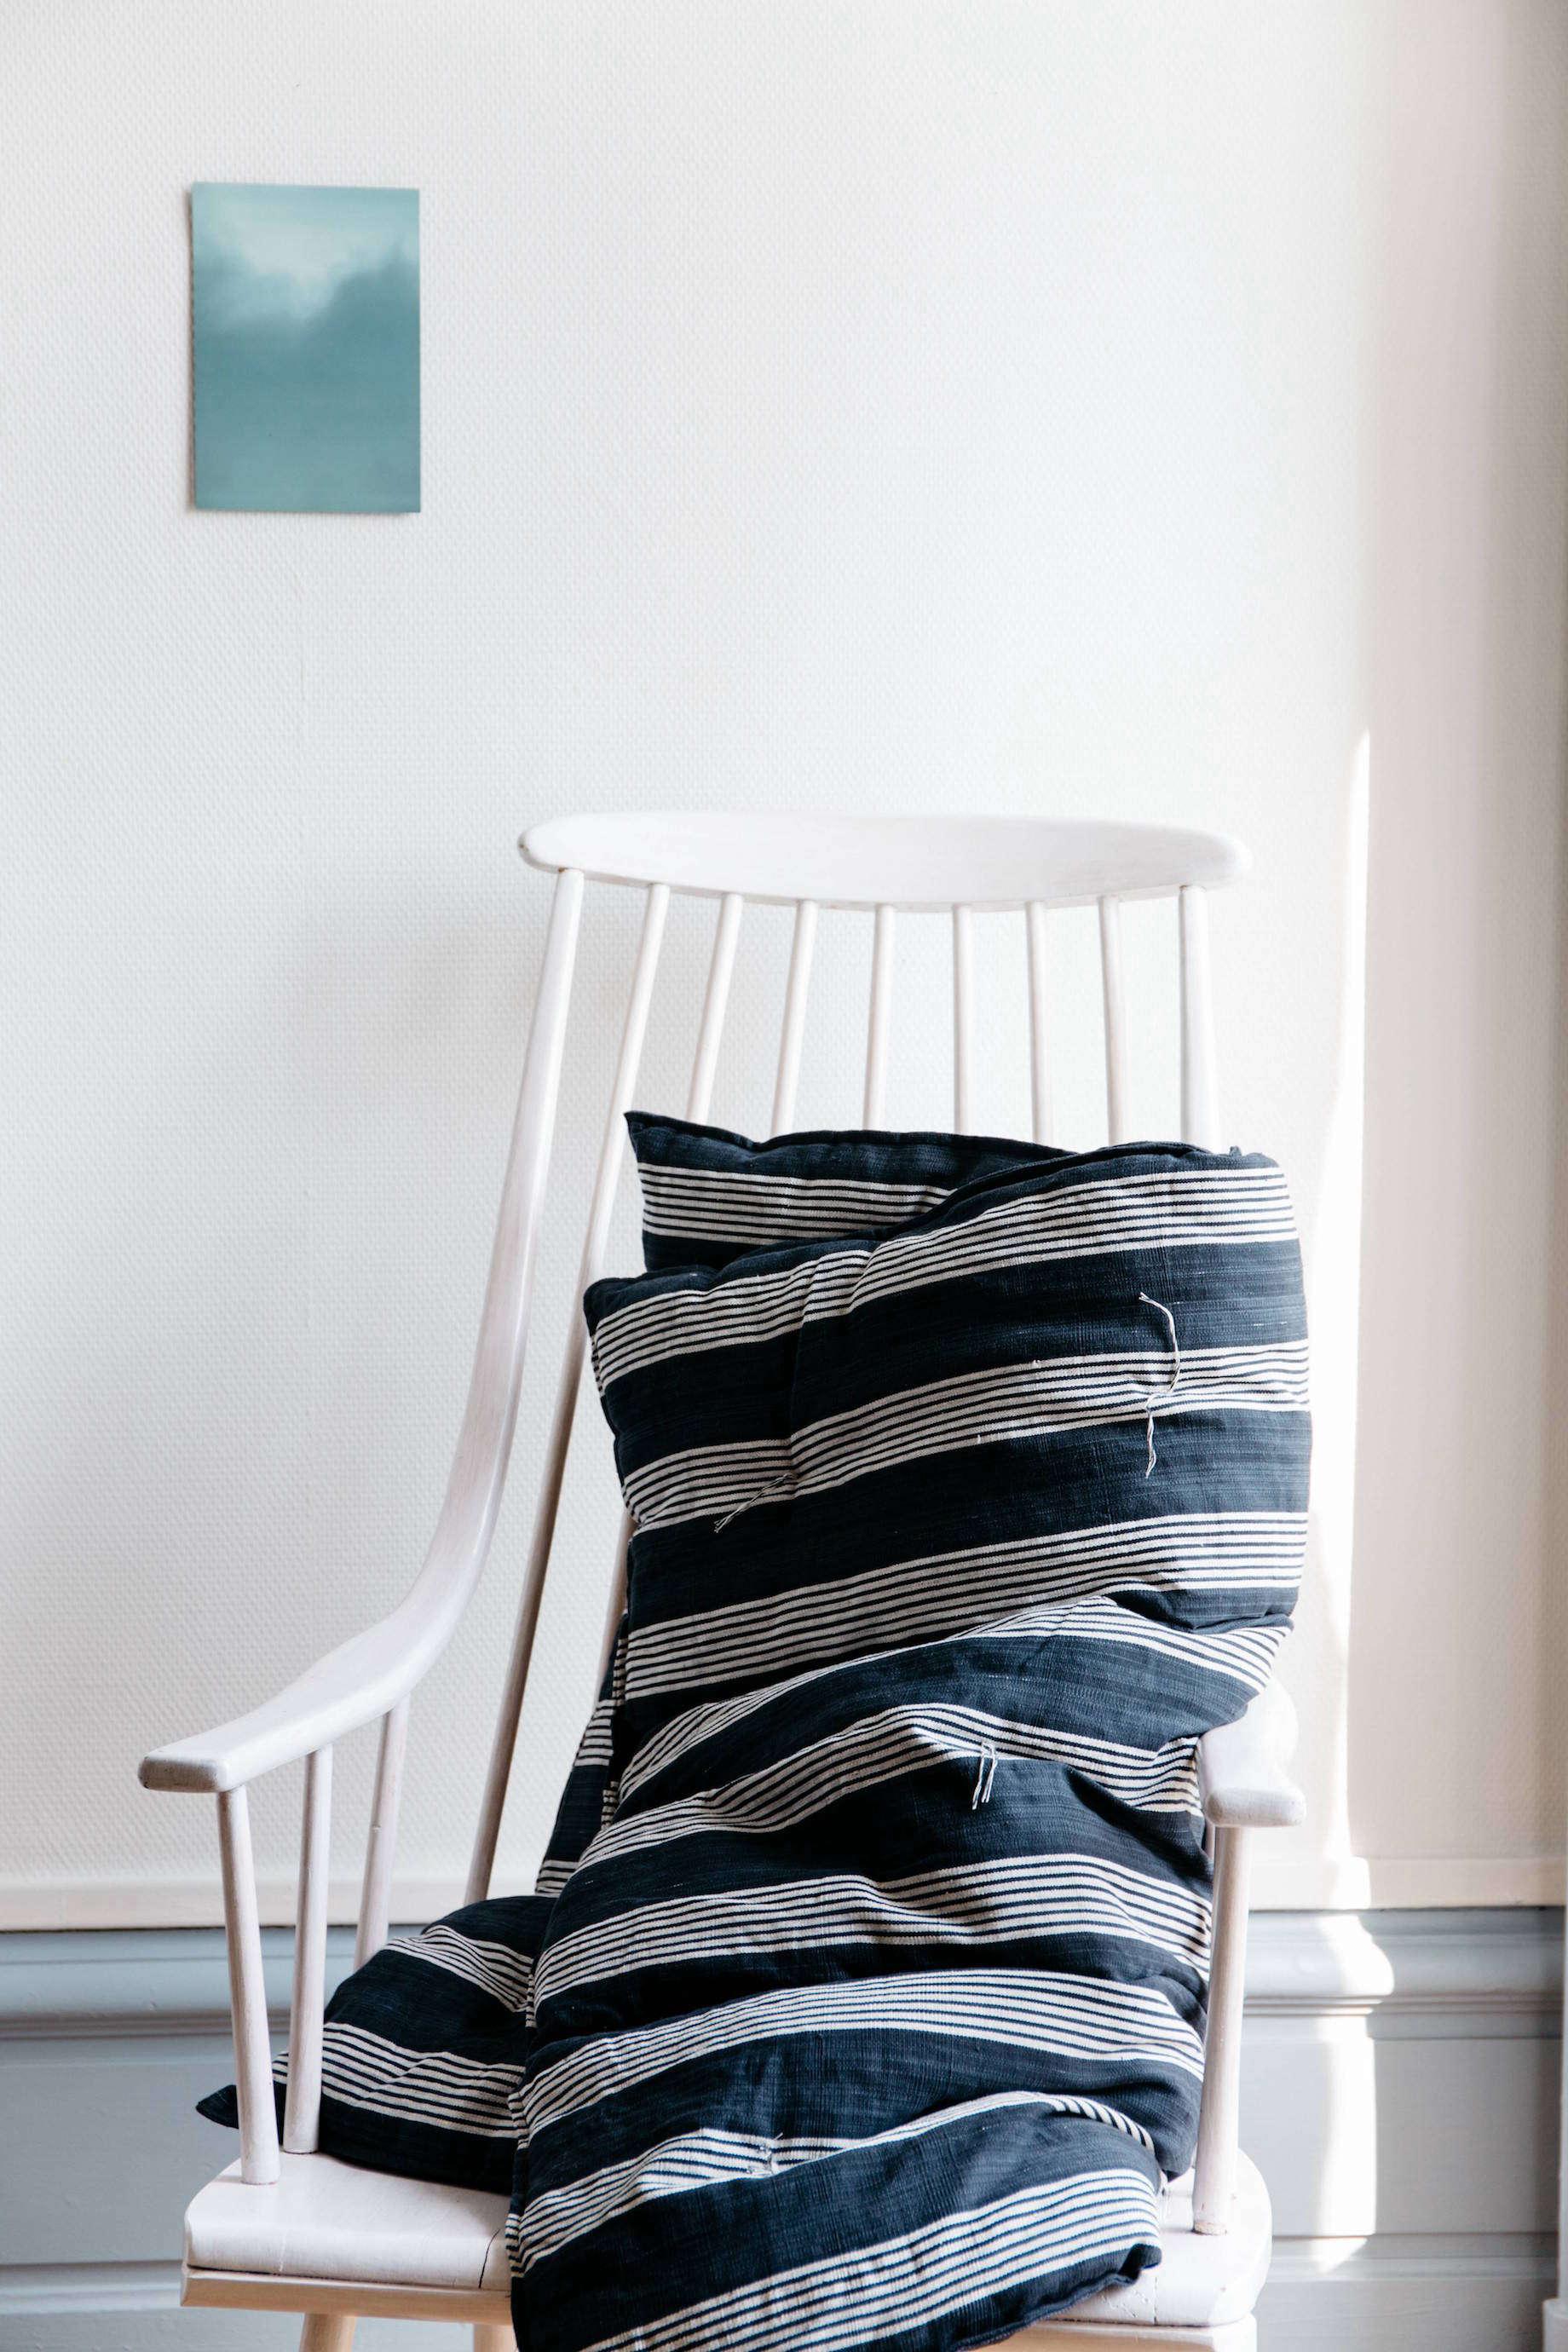 matelas striped overlay mattress from online shop le reperes des belettes | rem 16